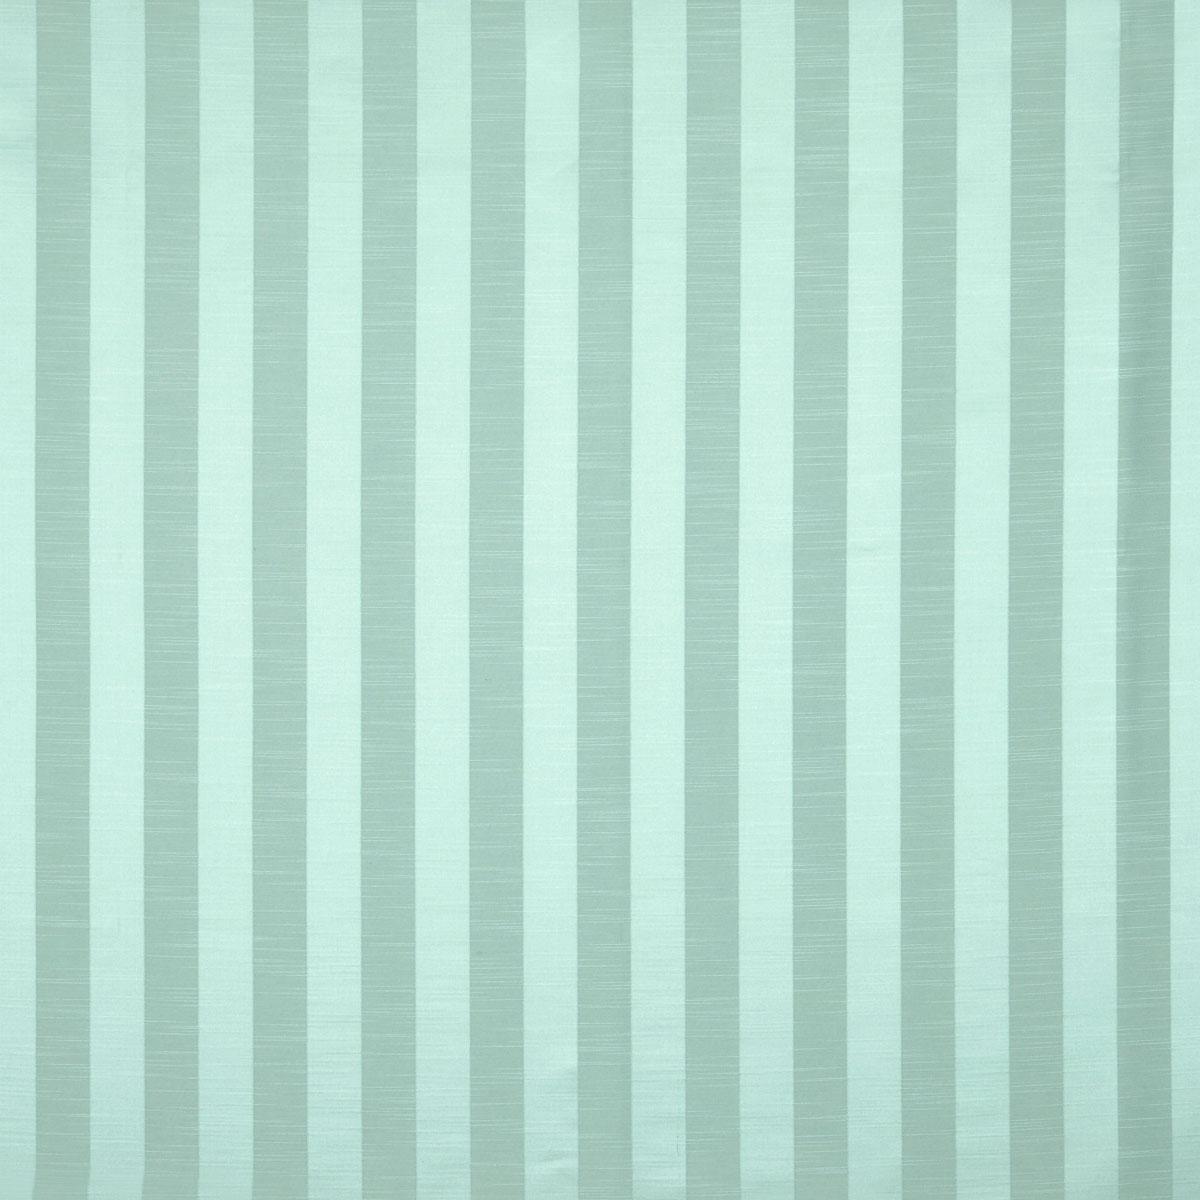 Teal Ascot Stripe Curtain Fabric